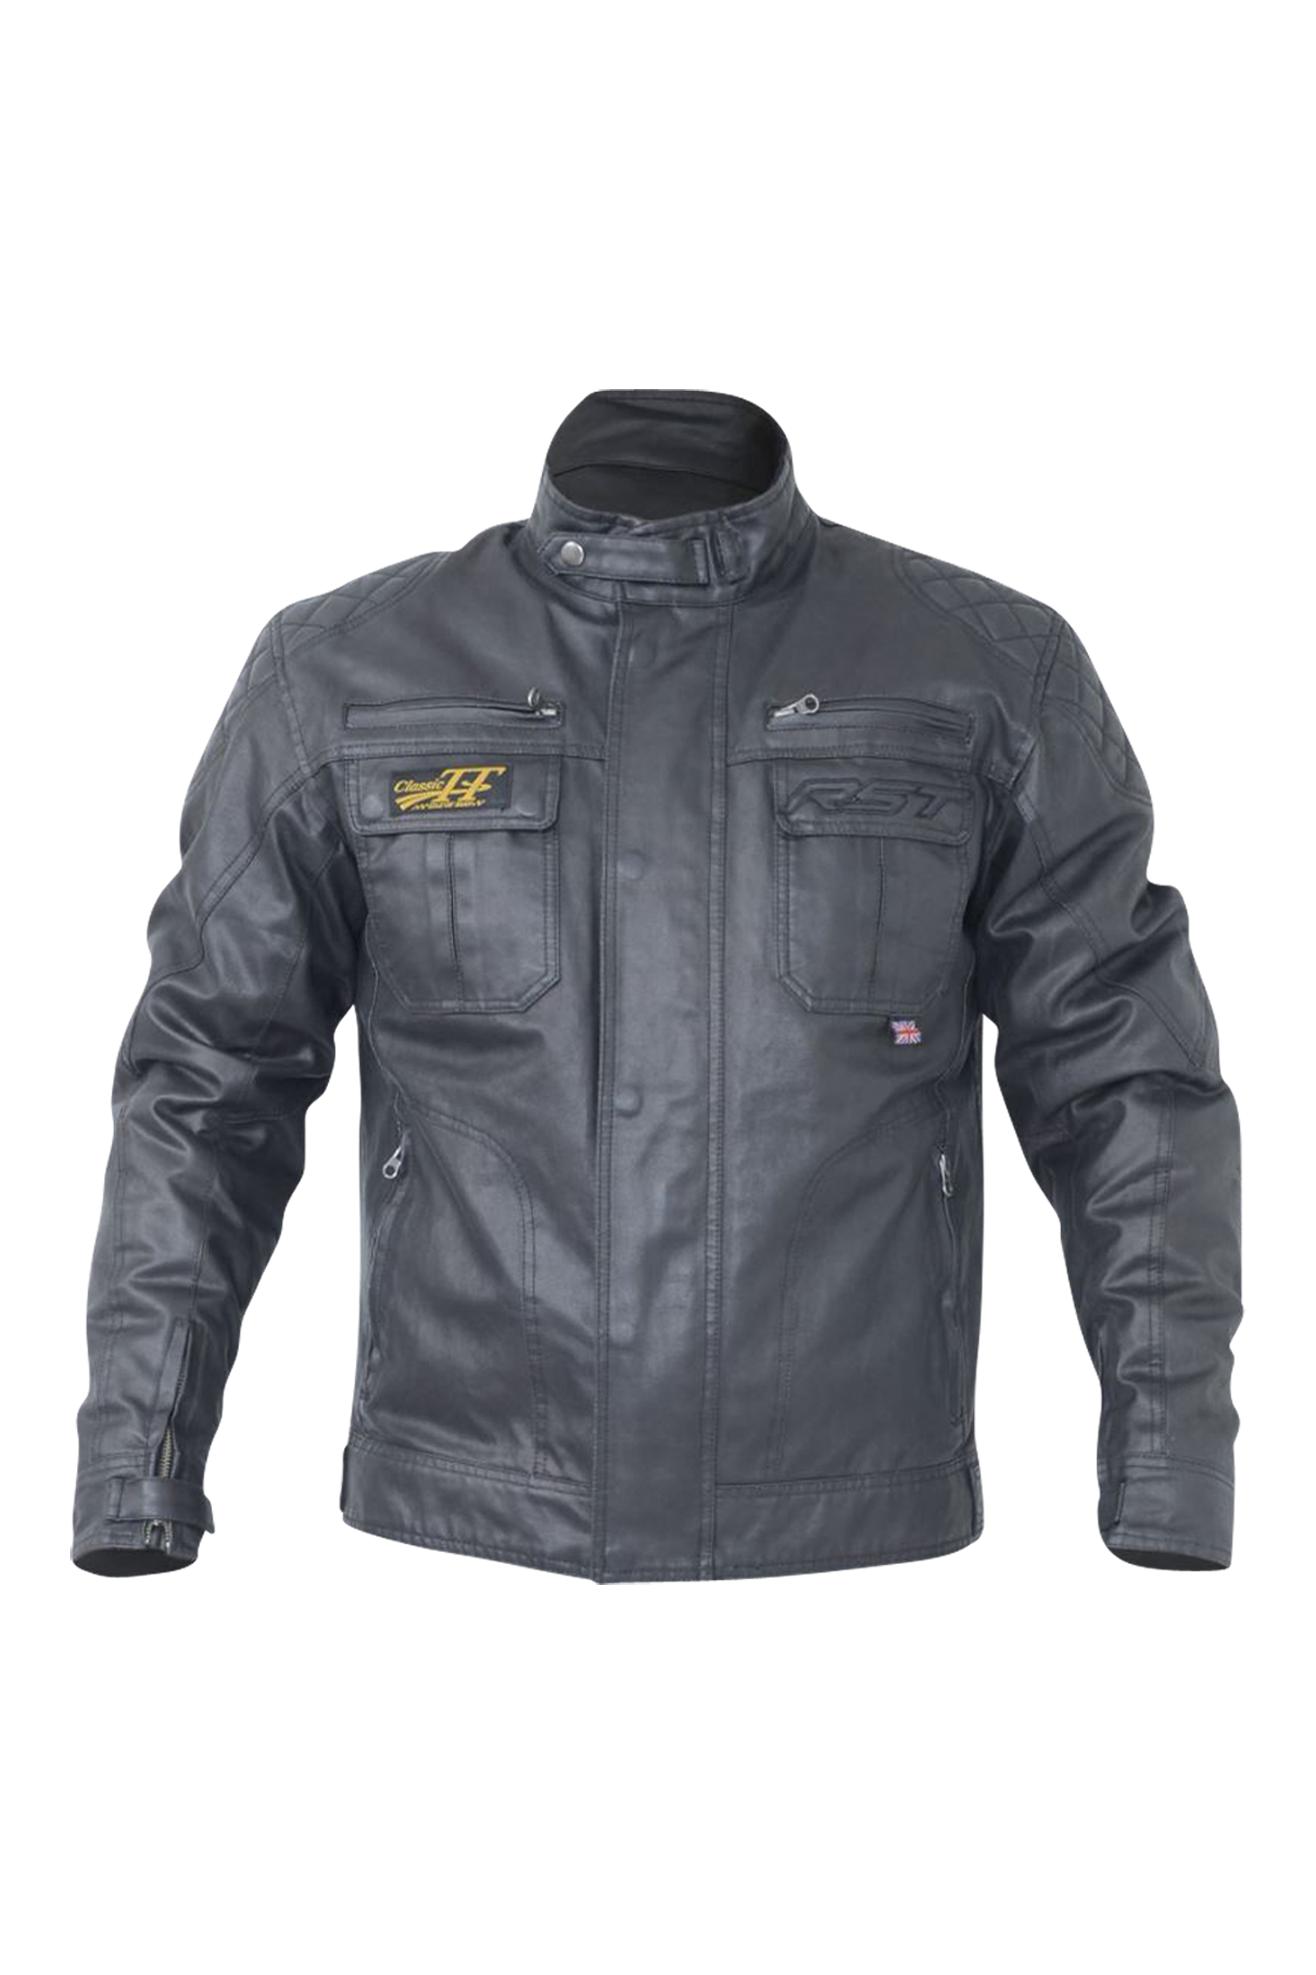 rst giacca moto  classic tt wax ii nera